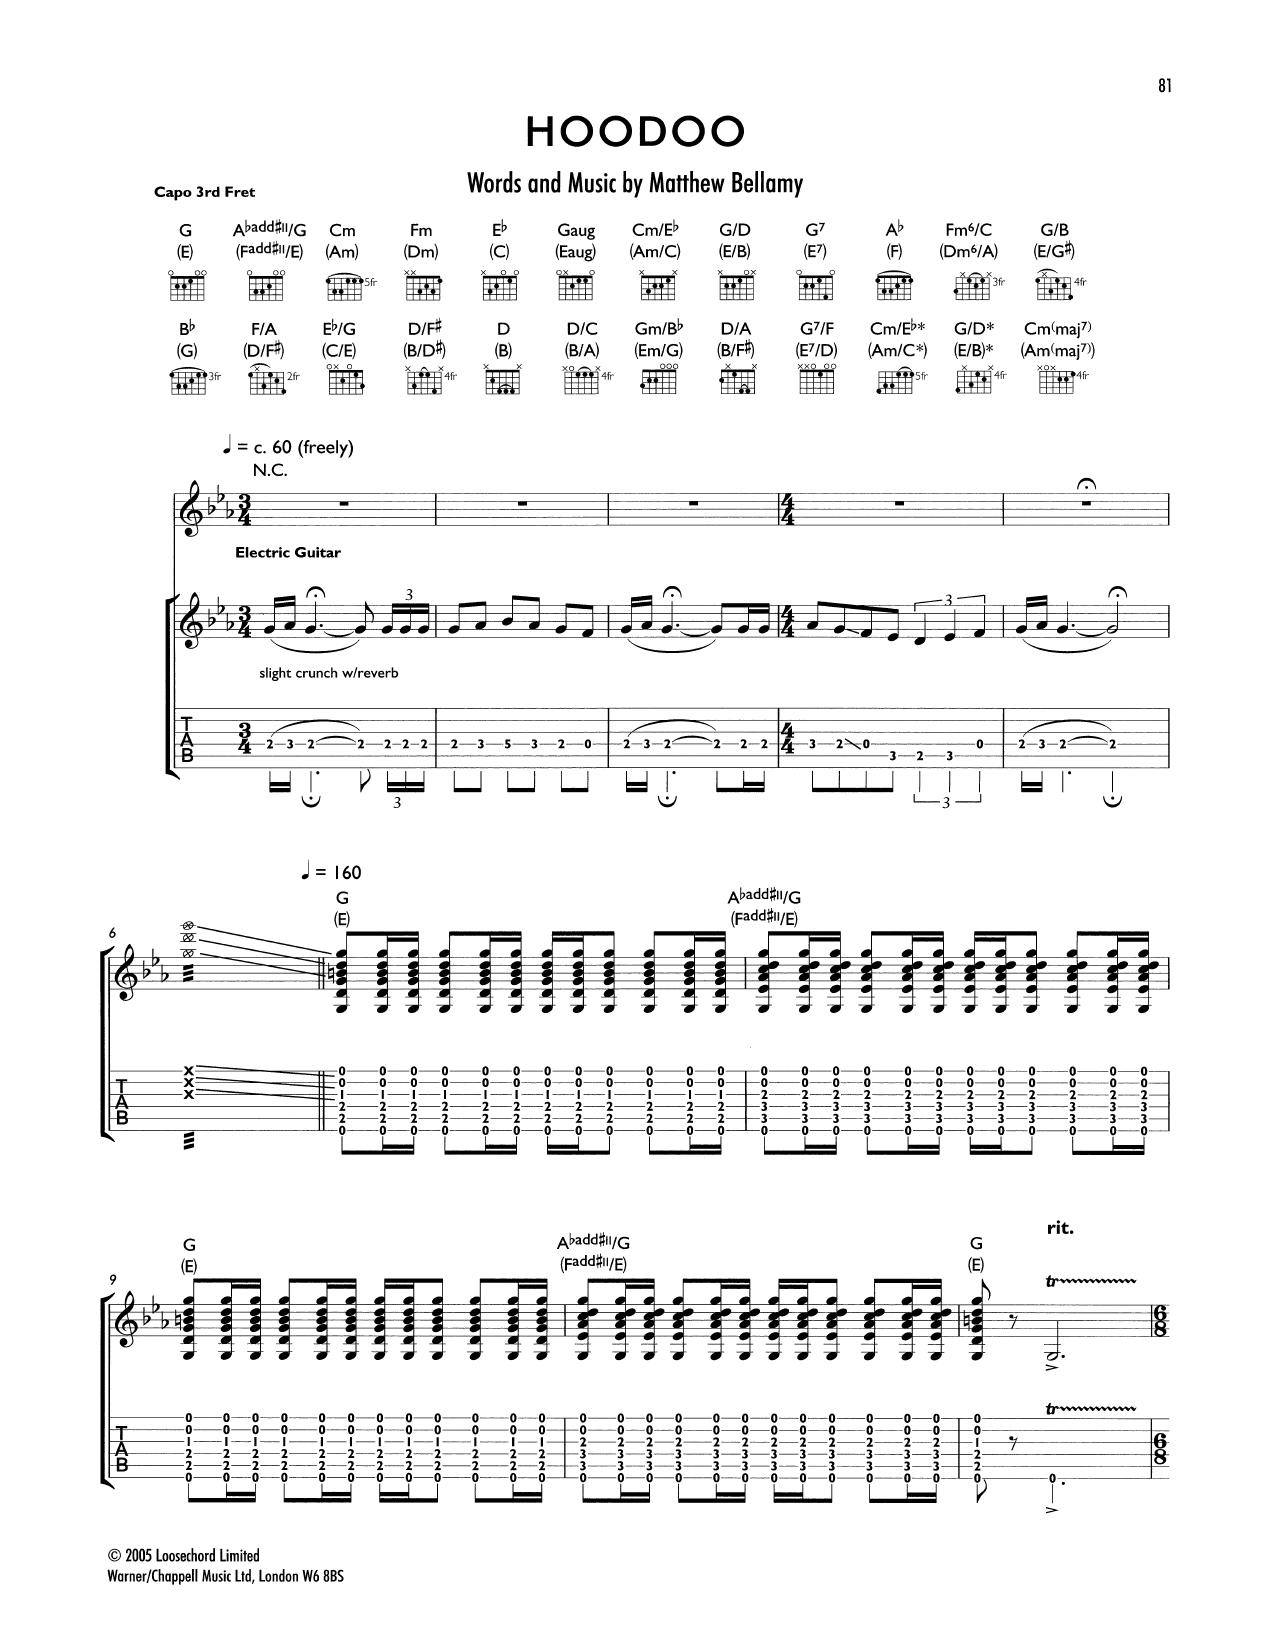 Hoodoo Sheet Music